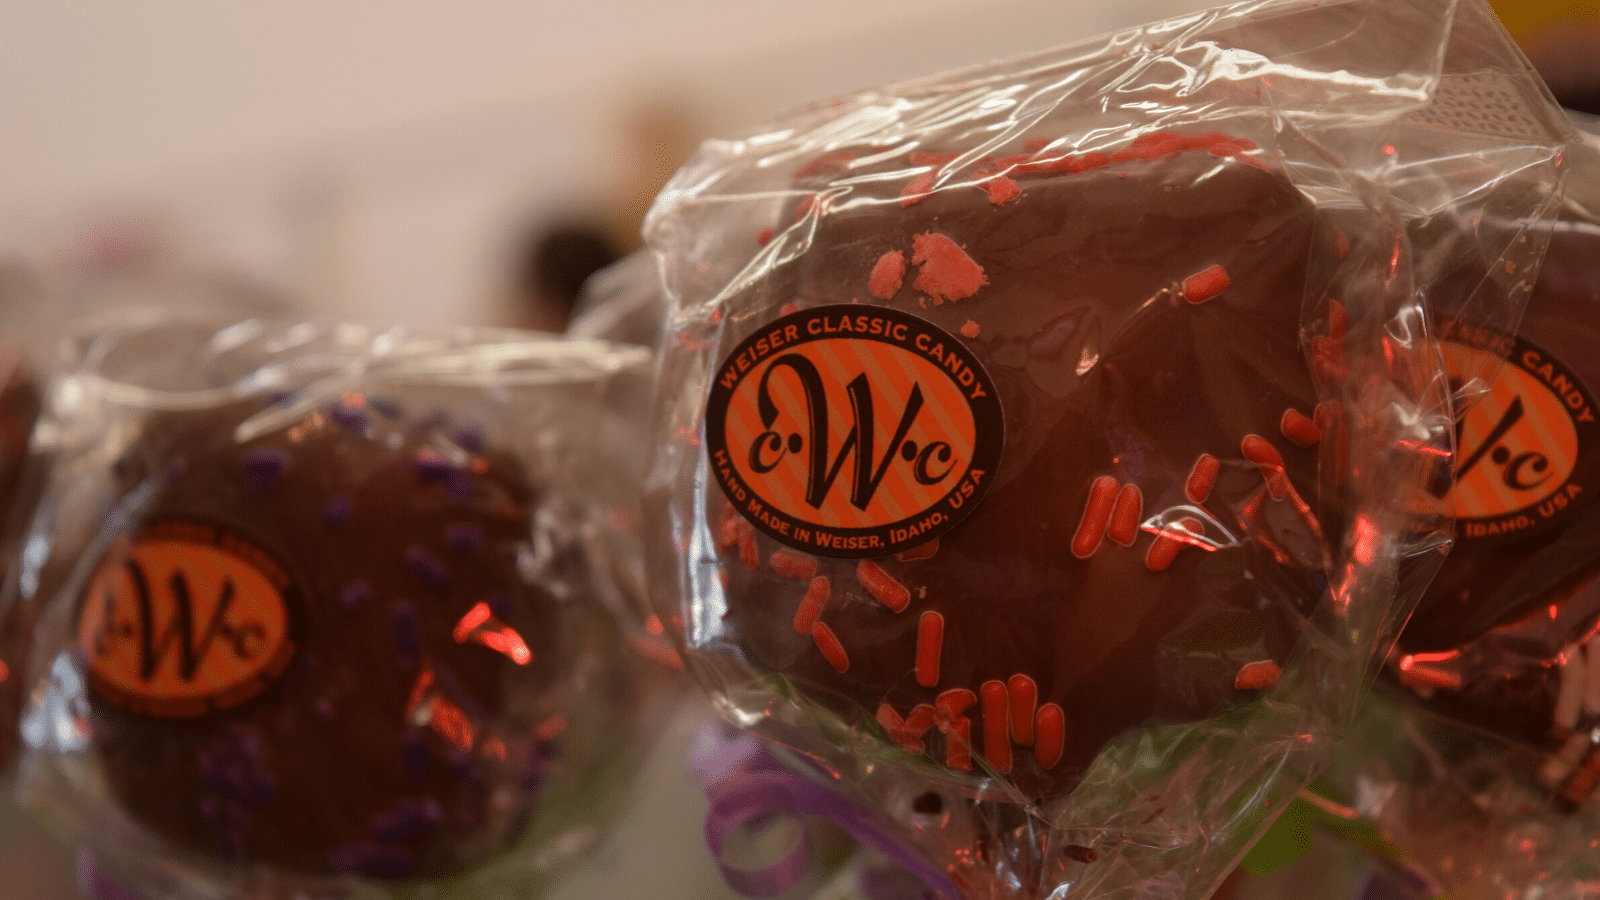 Weiser Classic Candy